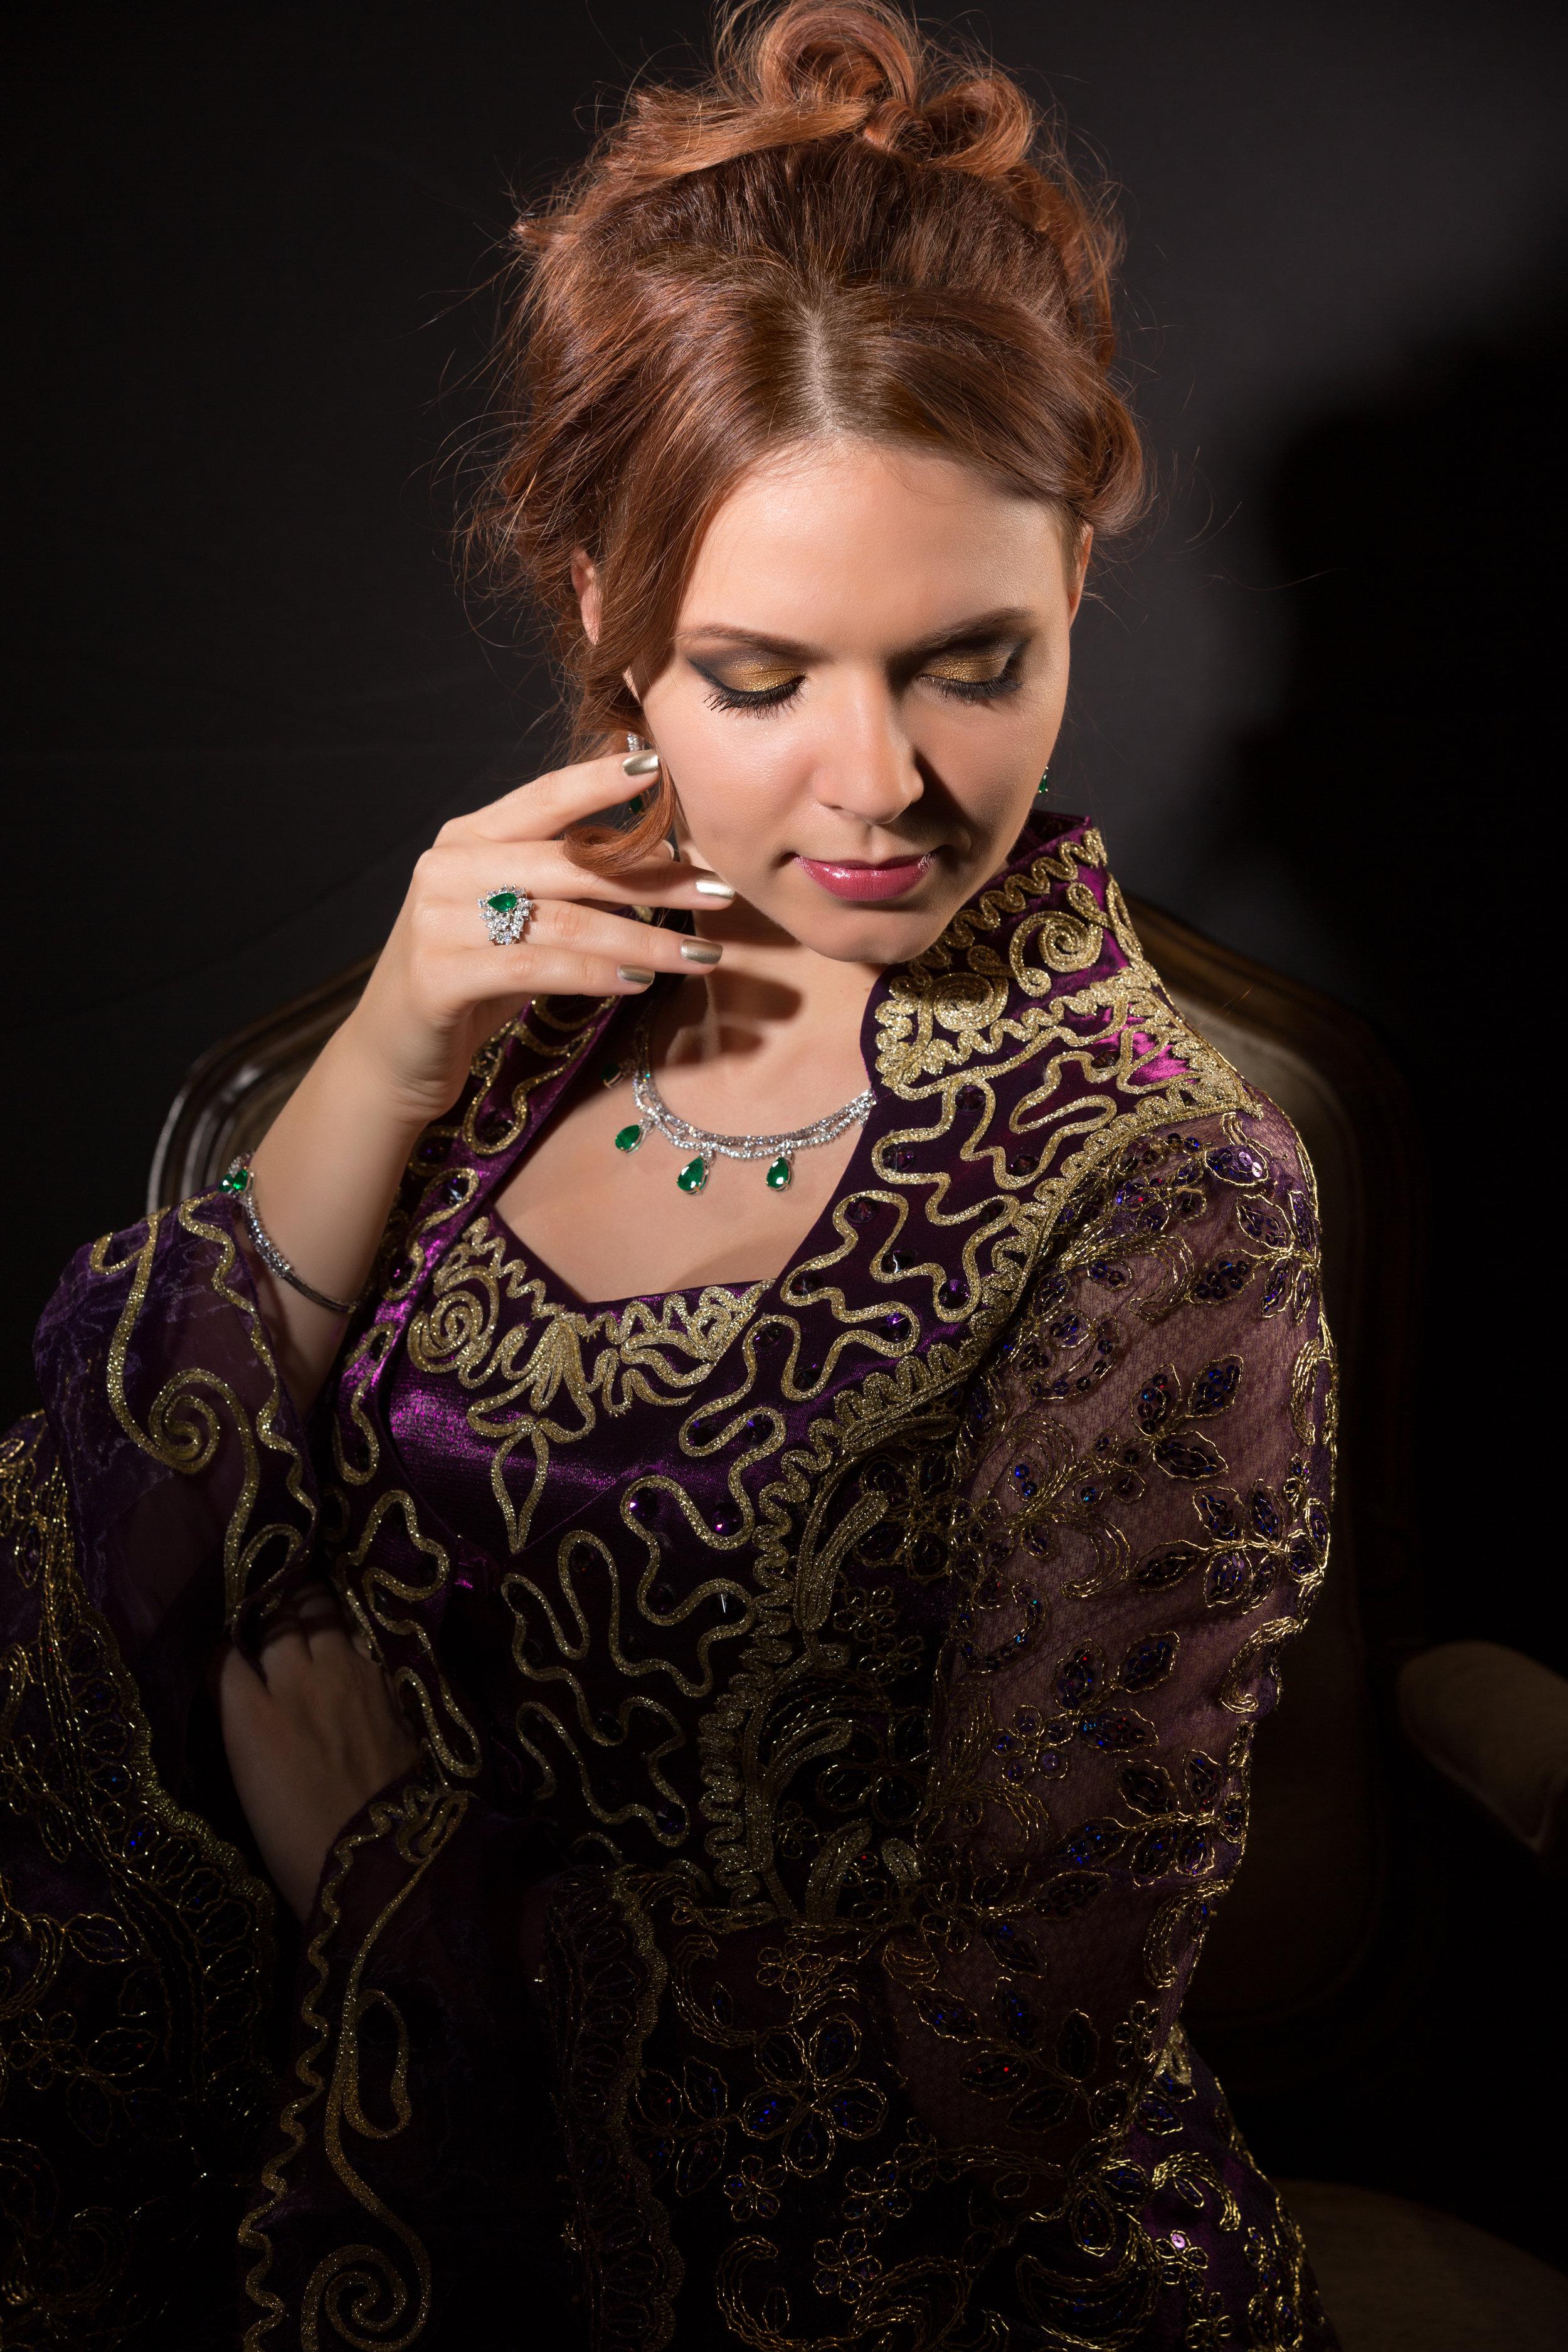 Photo by Pedro Bonatto-purple dress-2c.jpg